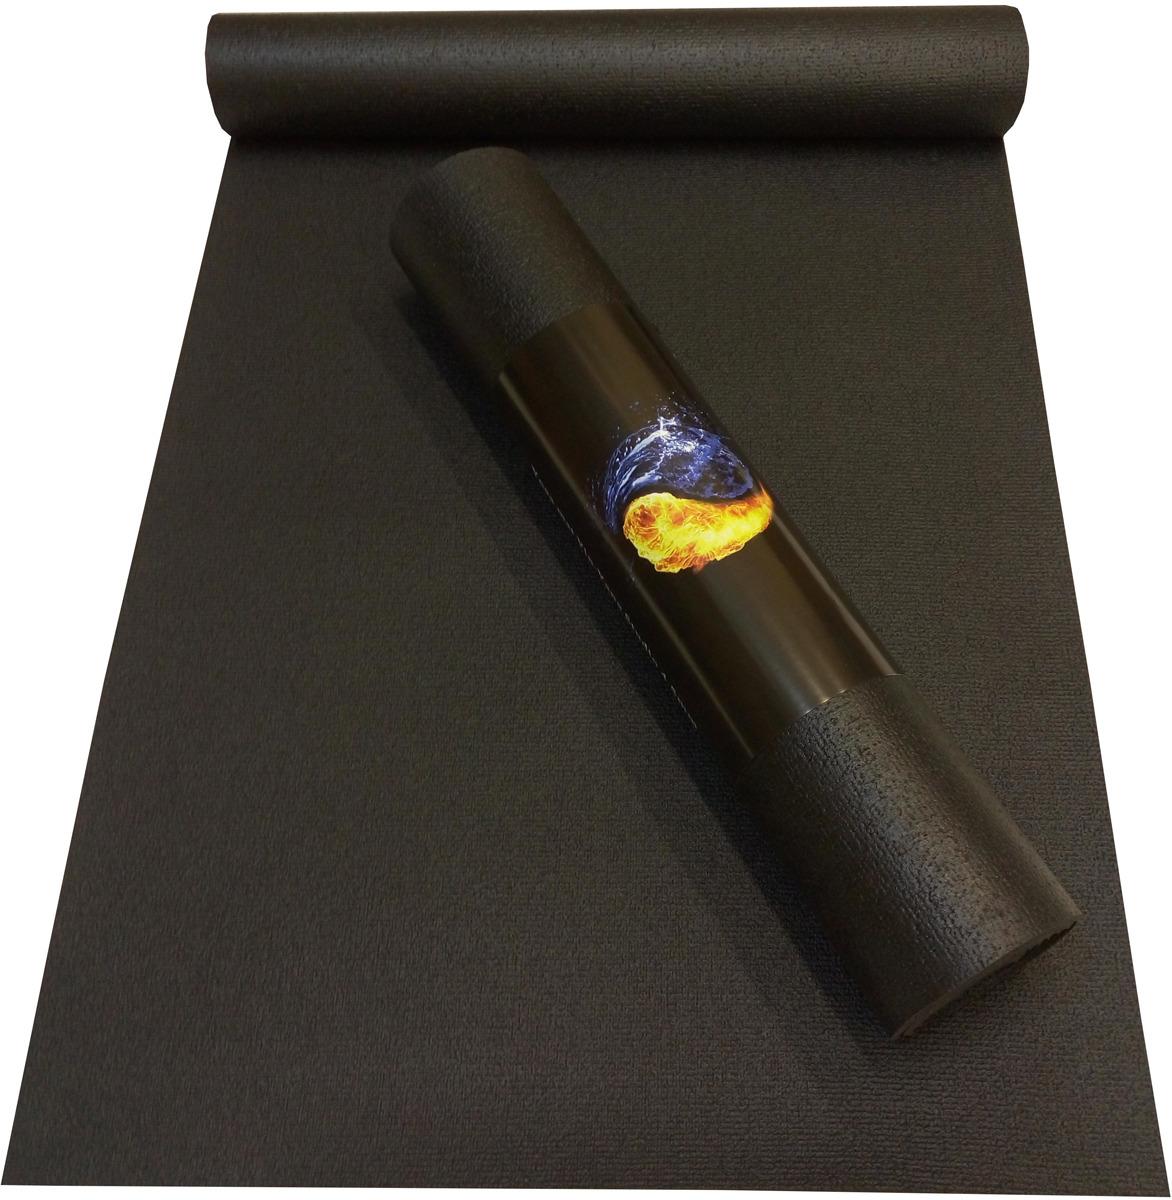 Коврик для йоги Ako-Yoga Yin-Yang Studio, цвет: черный, 185 х 60 х 0,3 см